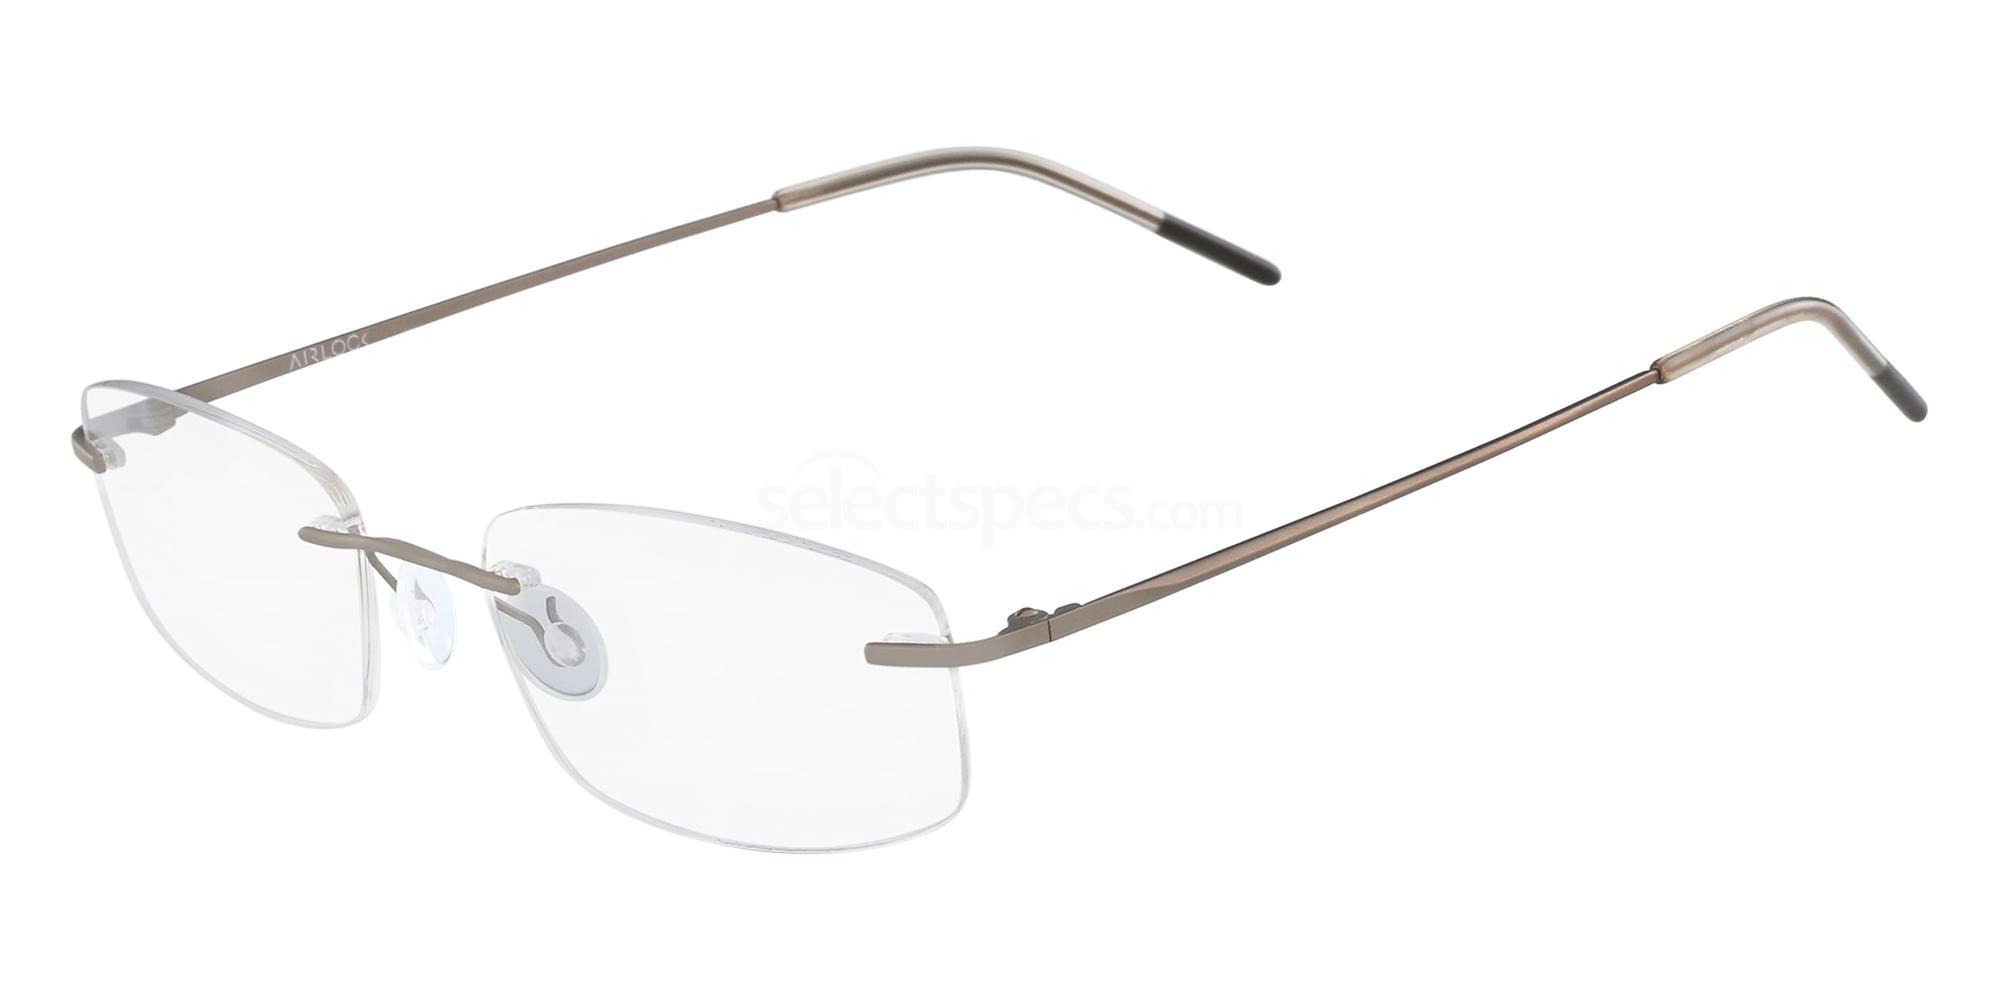 710 WISDOM 206 Glasses, AIRLOCK